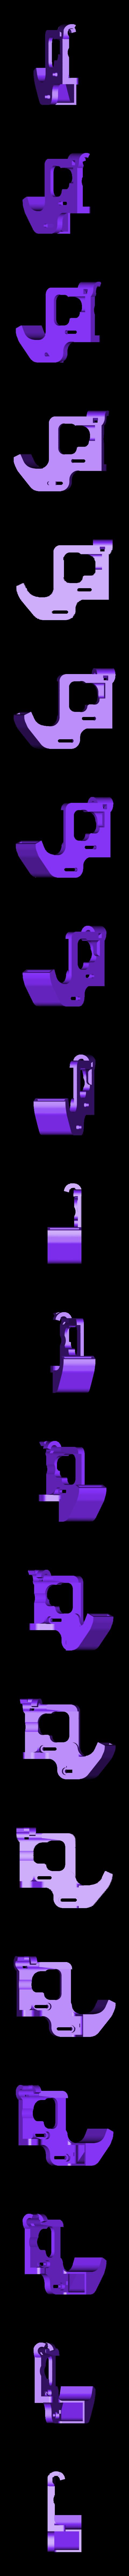 blowersingle.stl Download free STL file cr 10 , ender 2 - 3 , creality single blower 50mmx15 • 3D printing object, raffosan